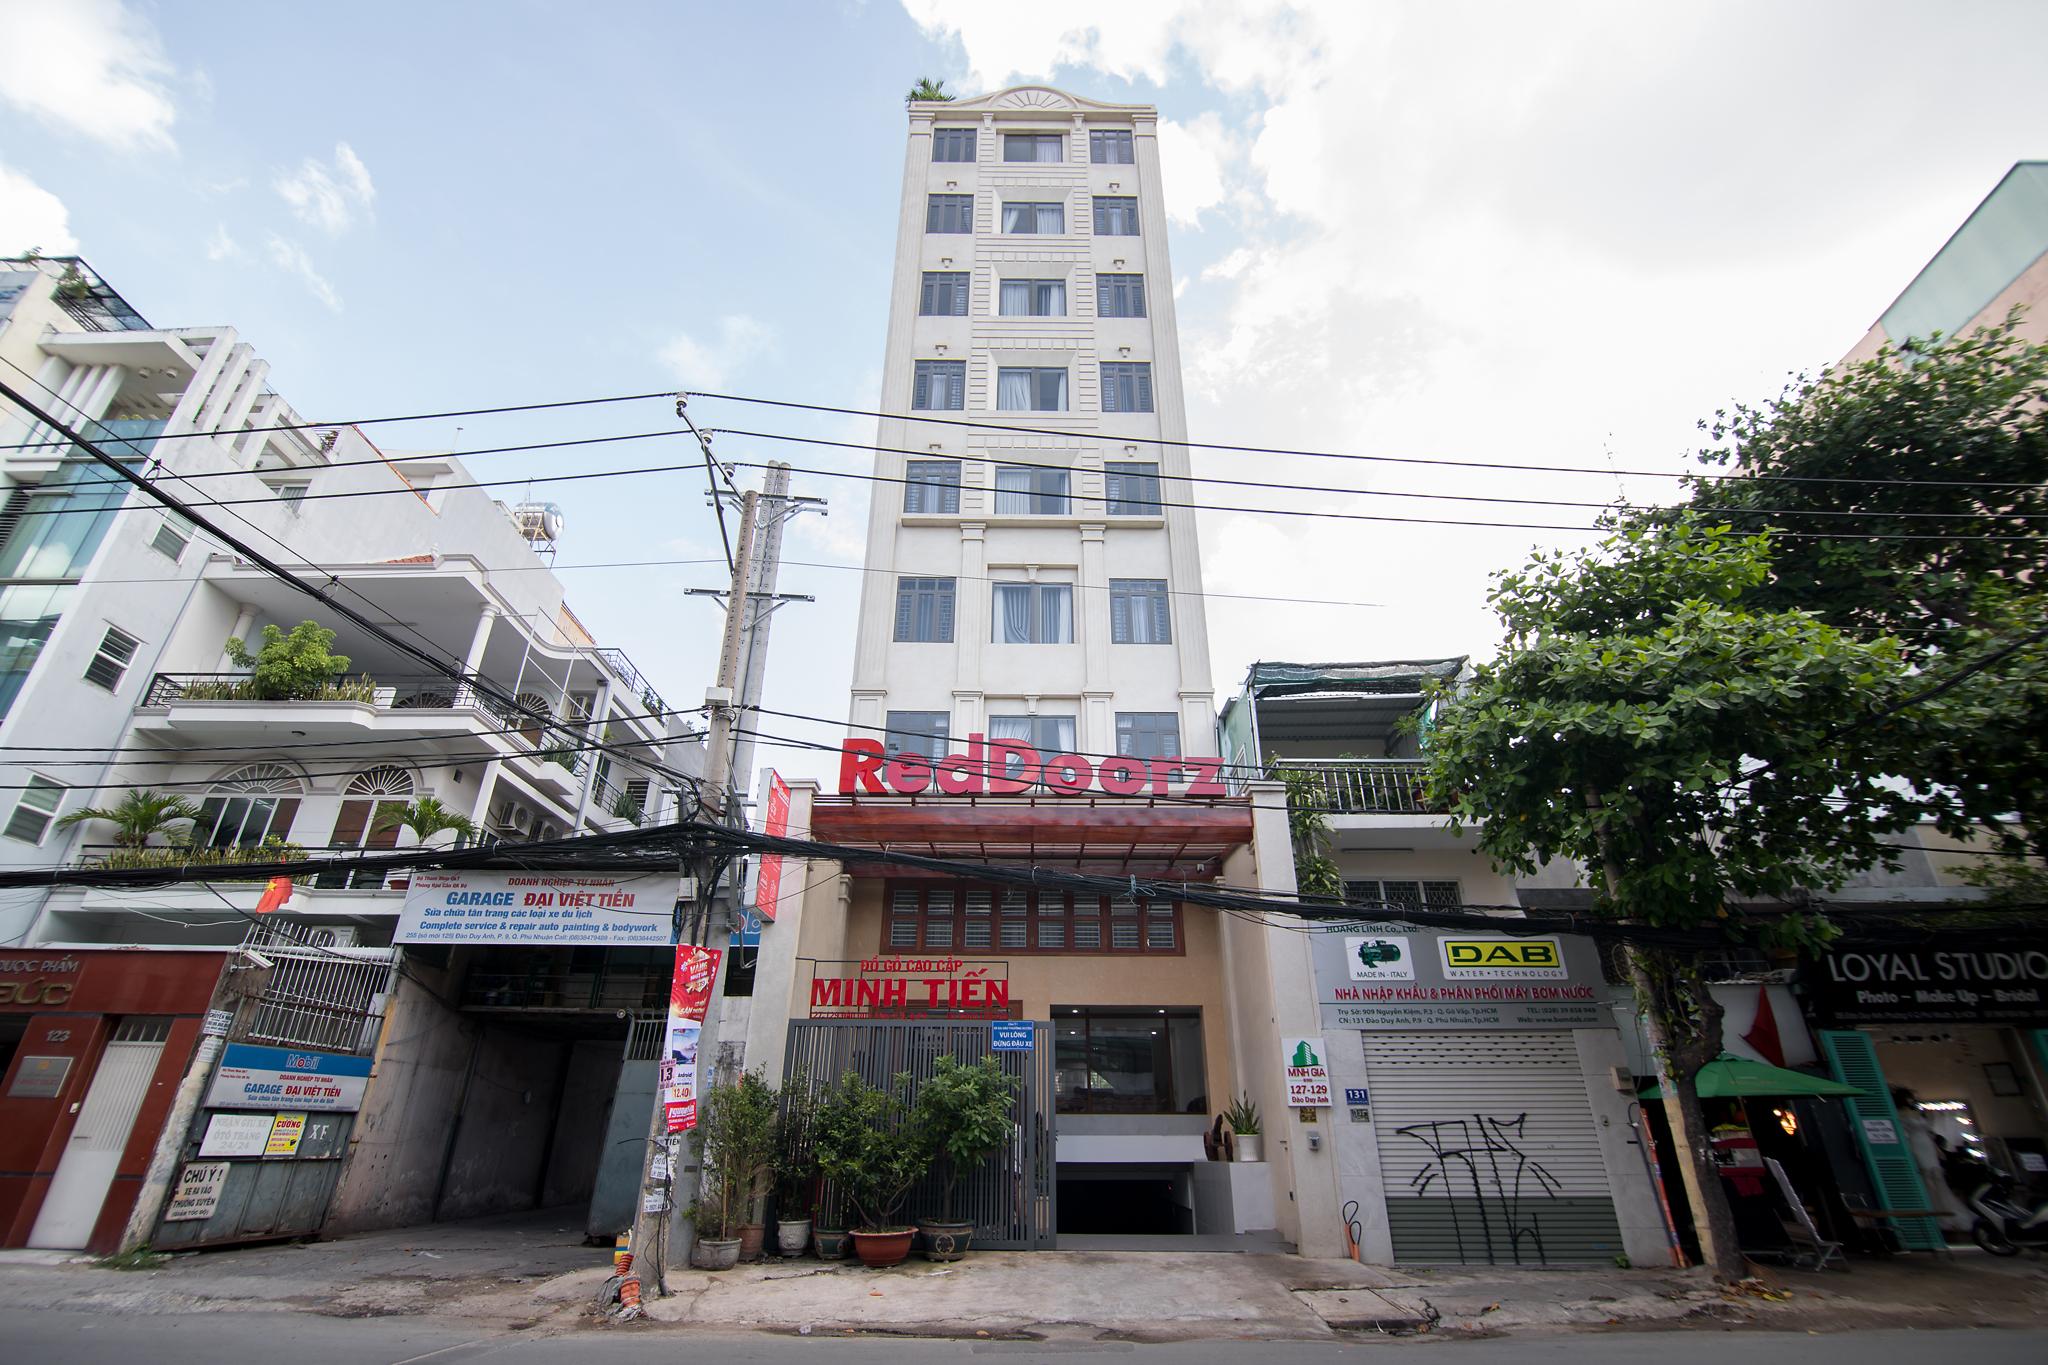 Reddoor Plus near Gia Dinh Park, Phú Nhuận